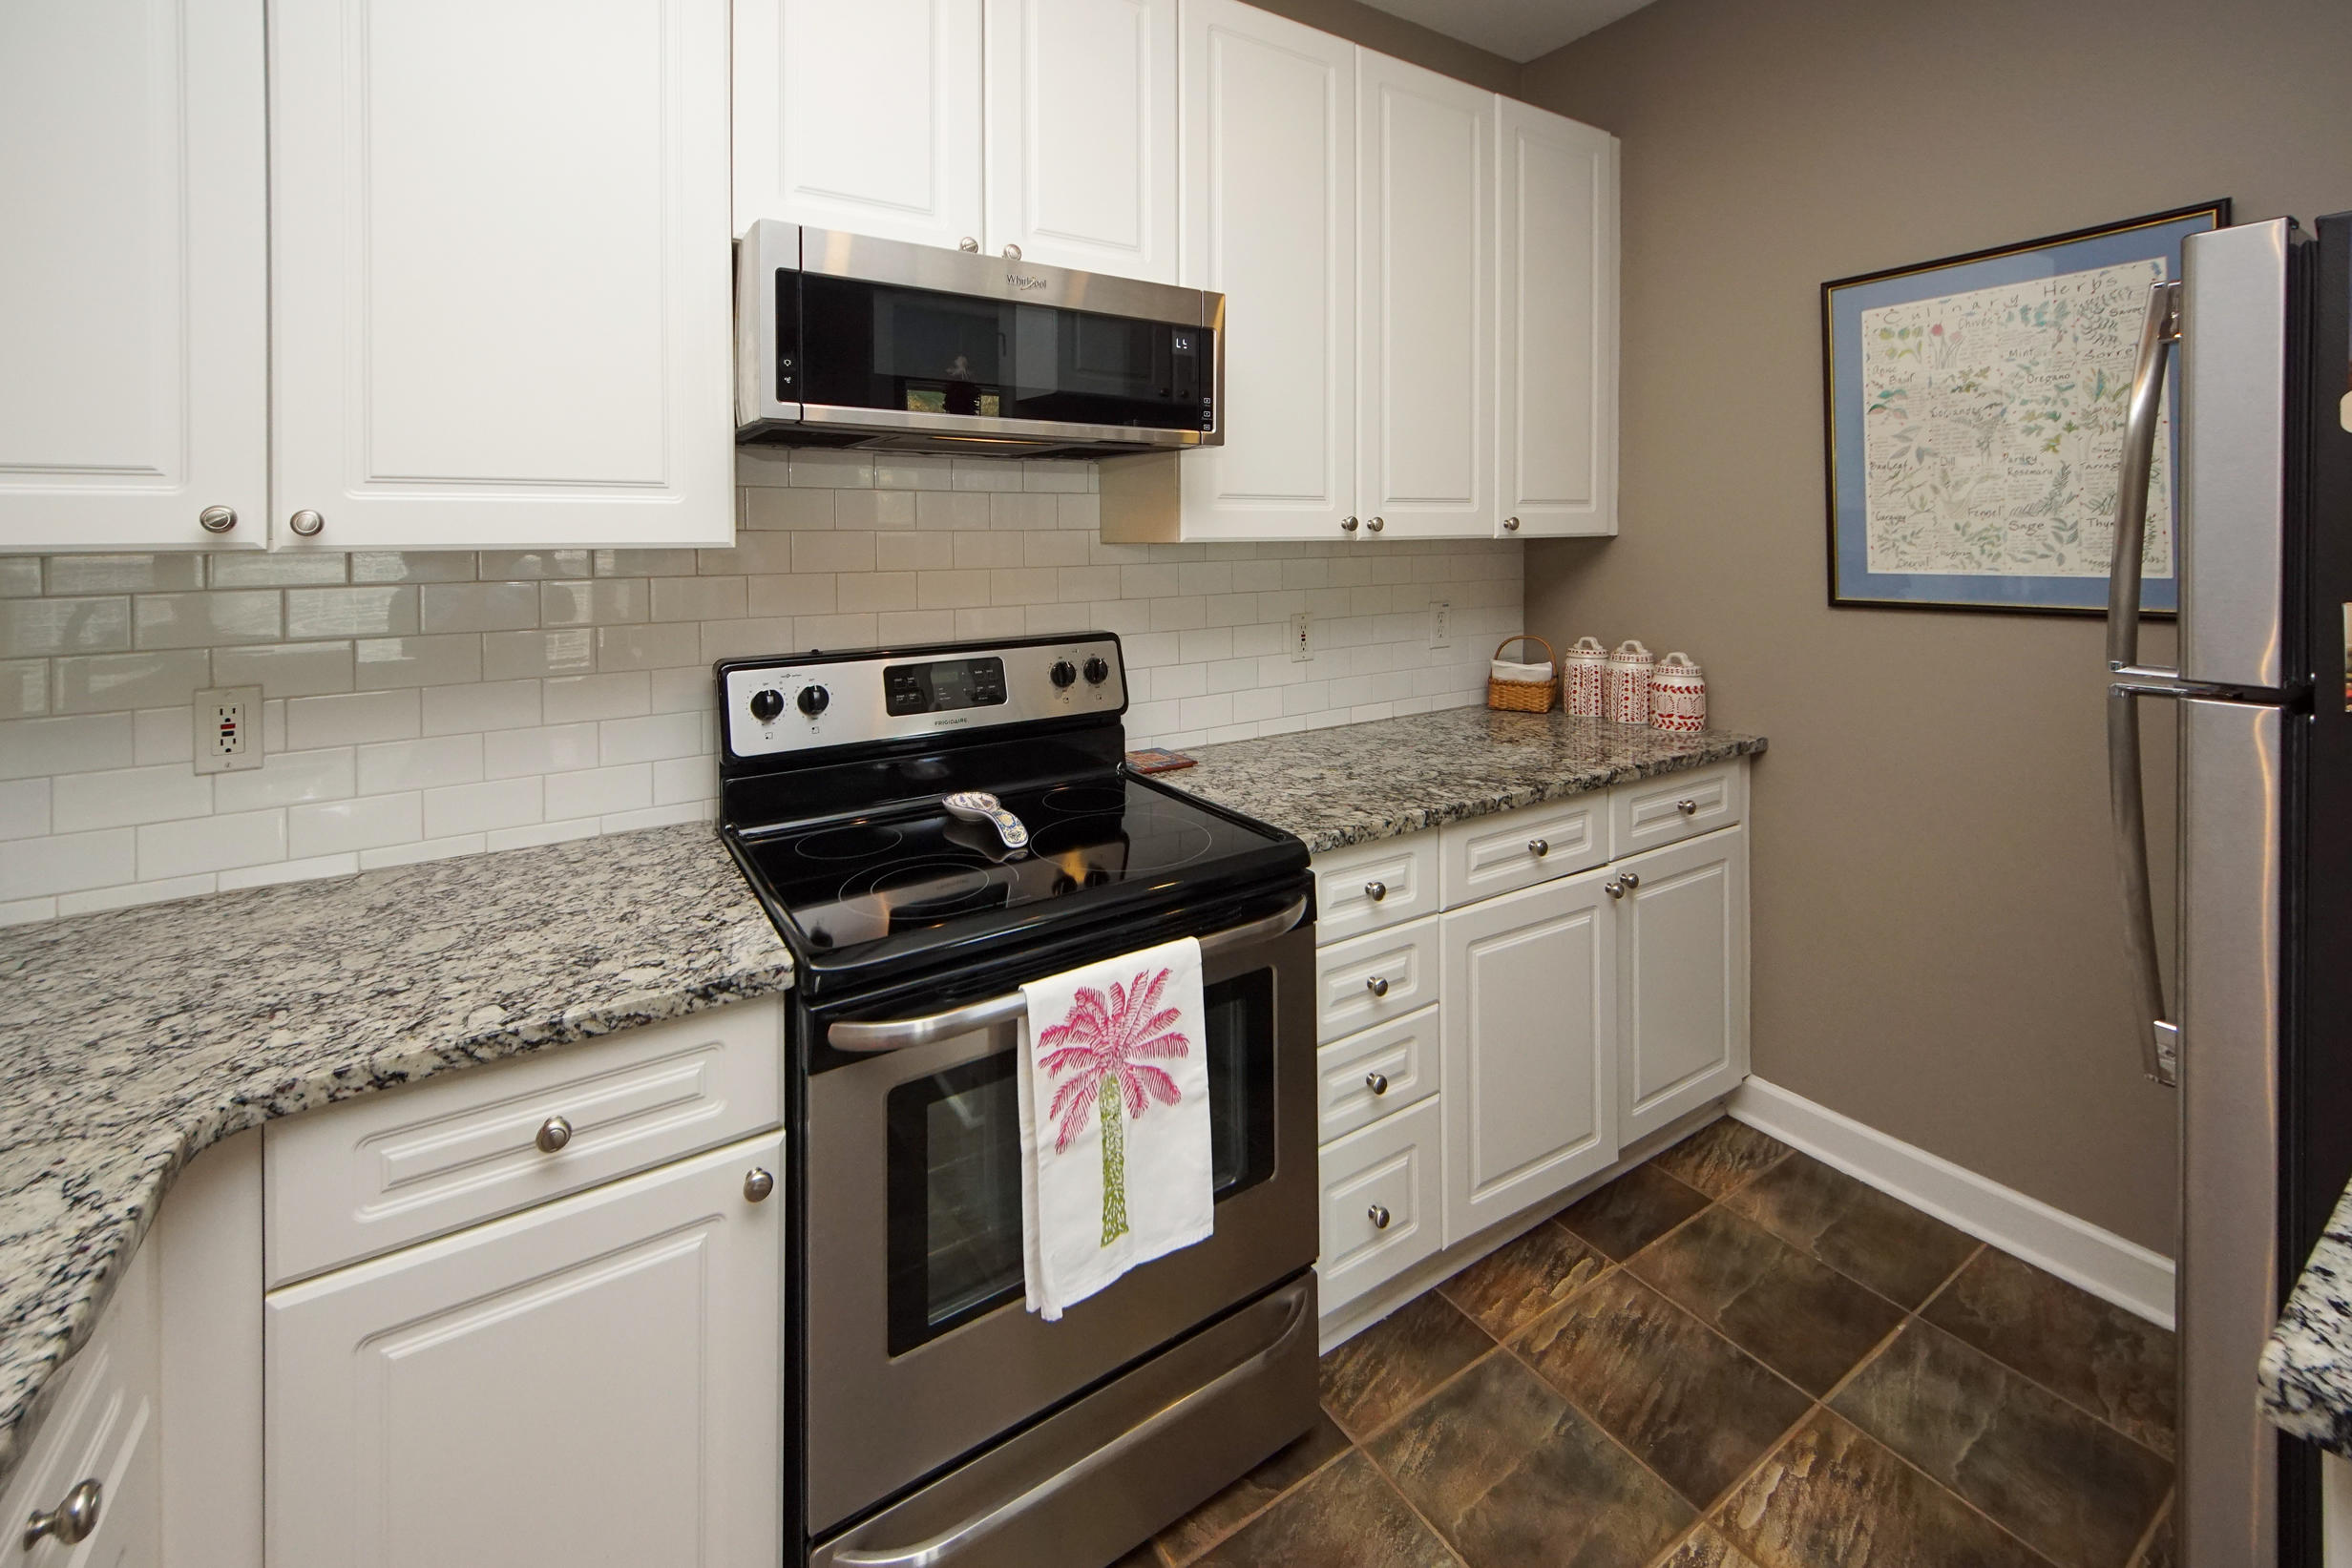 Dunes West Homes For Sale - 1631 Camfield, Mount Pleasant, SC - 4